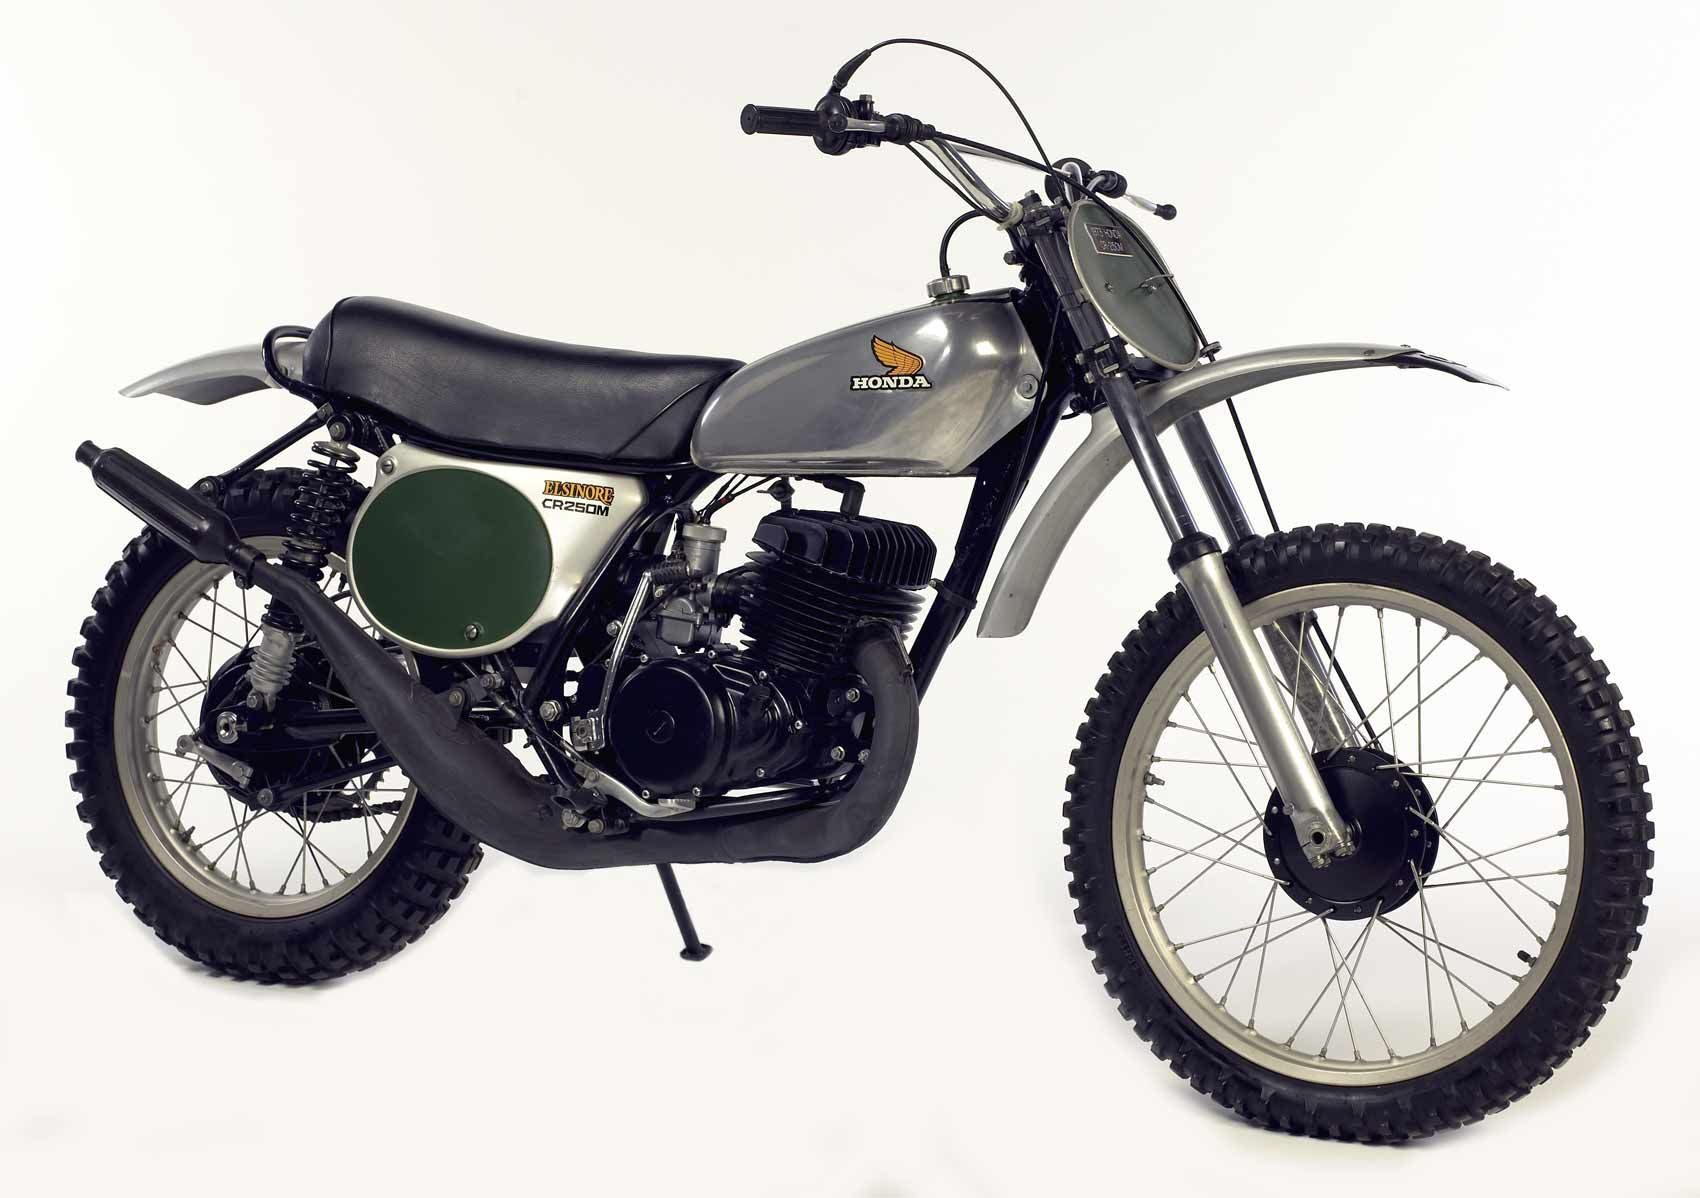 Honda Siap Lahirkan Kembali Motor Jadulnya Honda Elsinore Honda Honda Bikes Classic Motorcycles